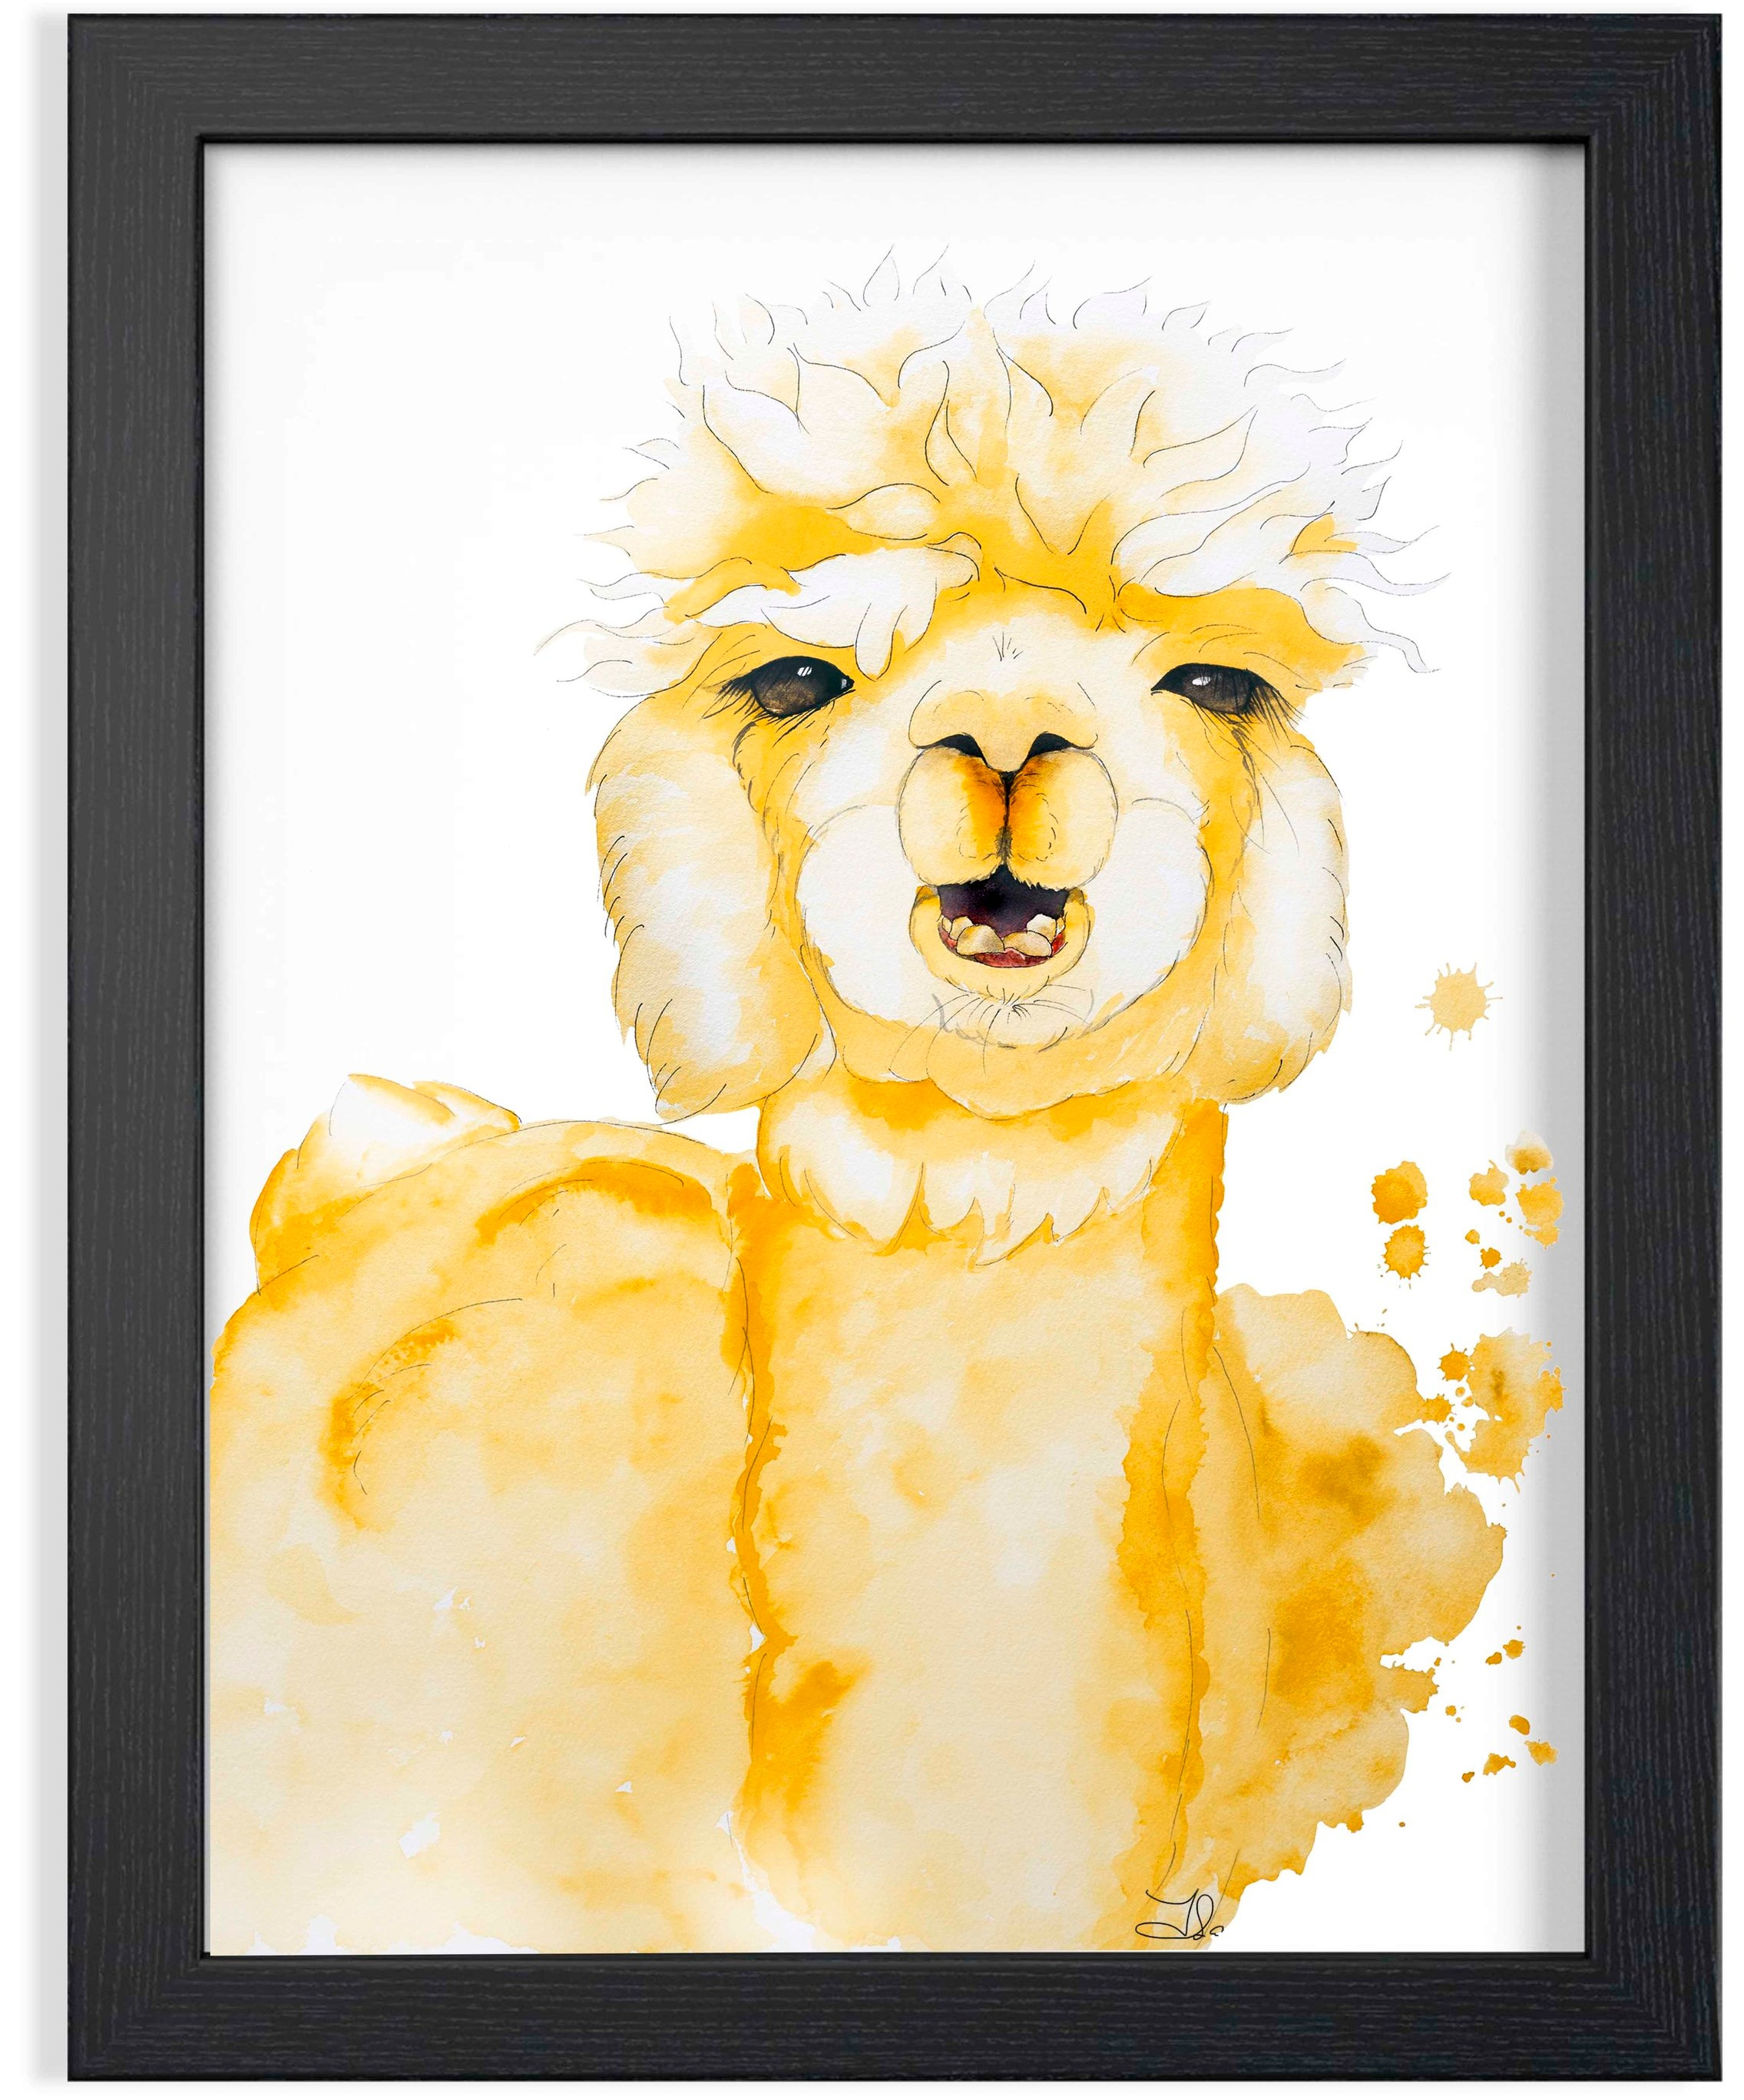 "Alpaca Watercolor  189. 00 $CA Fabriano Artistico 100% Cotton  Original watercolor painting 16 x 20"" (41 x 51 cm)"